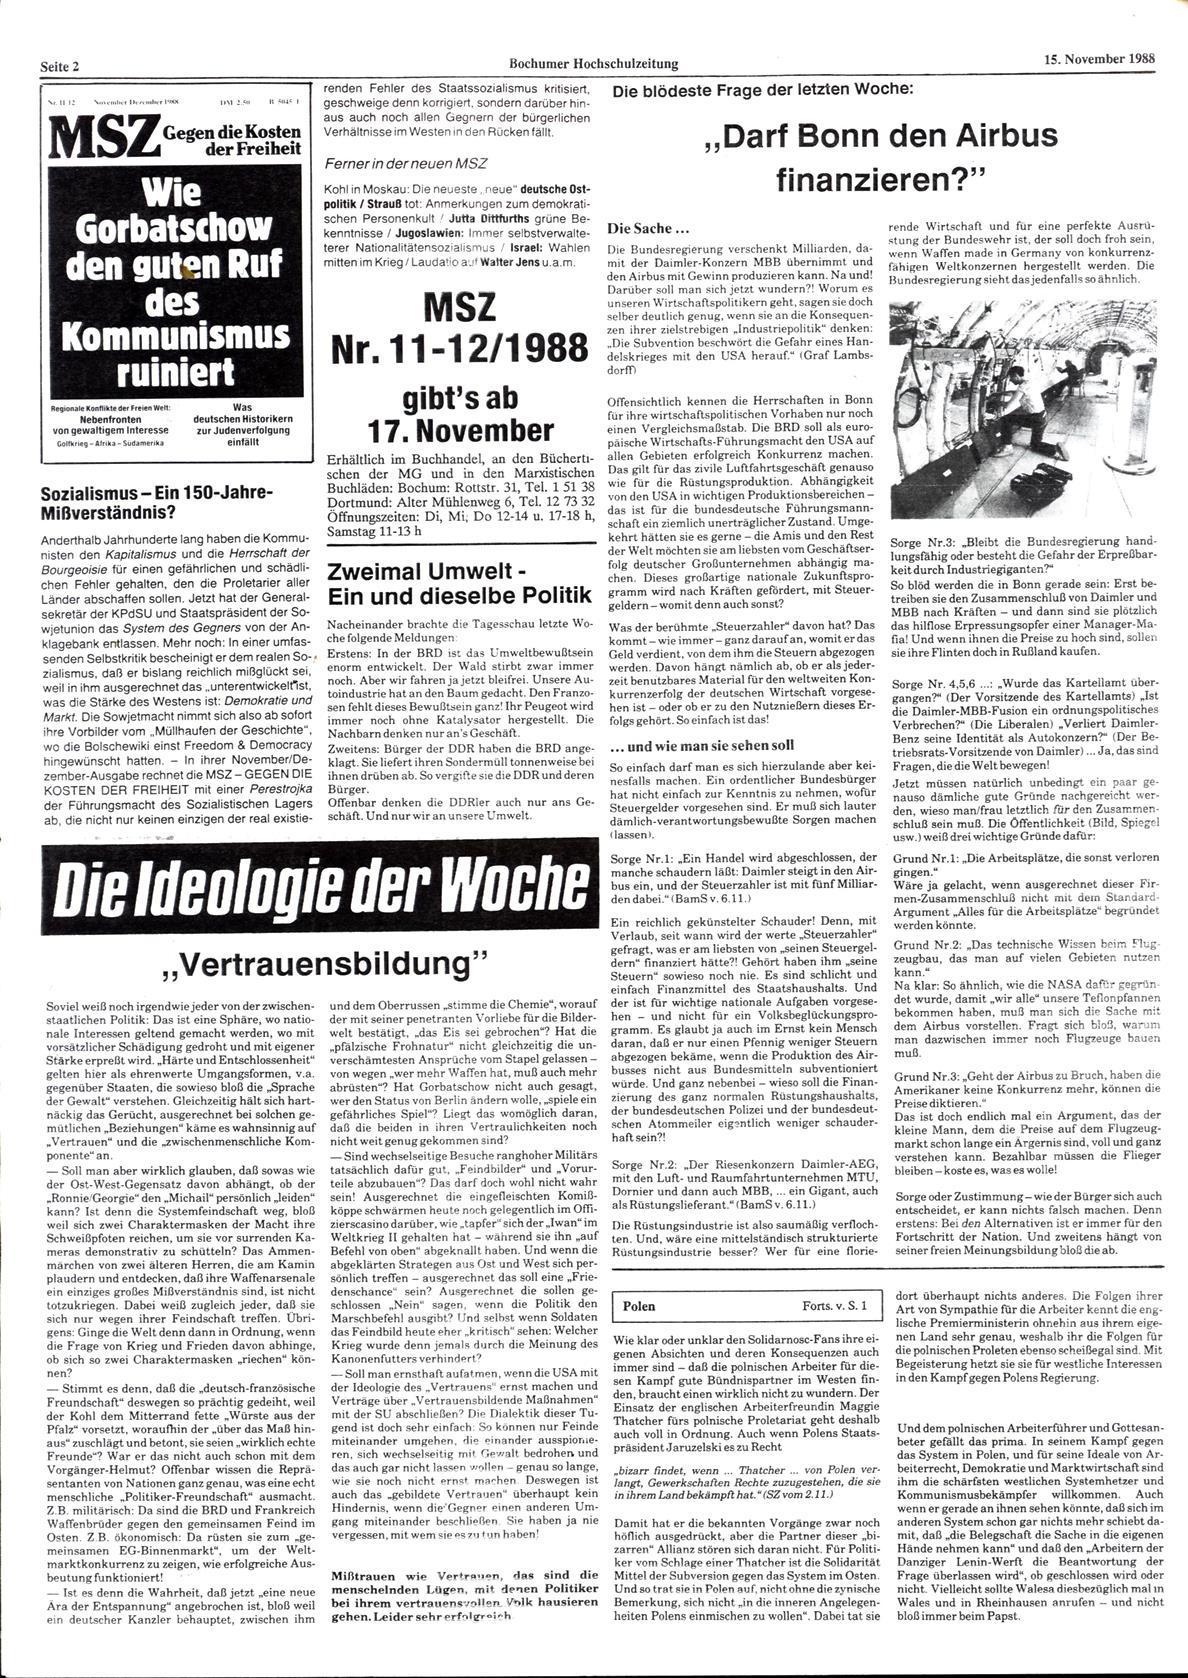 Bochum_BHZ_19881115_181_002